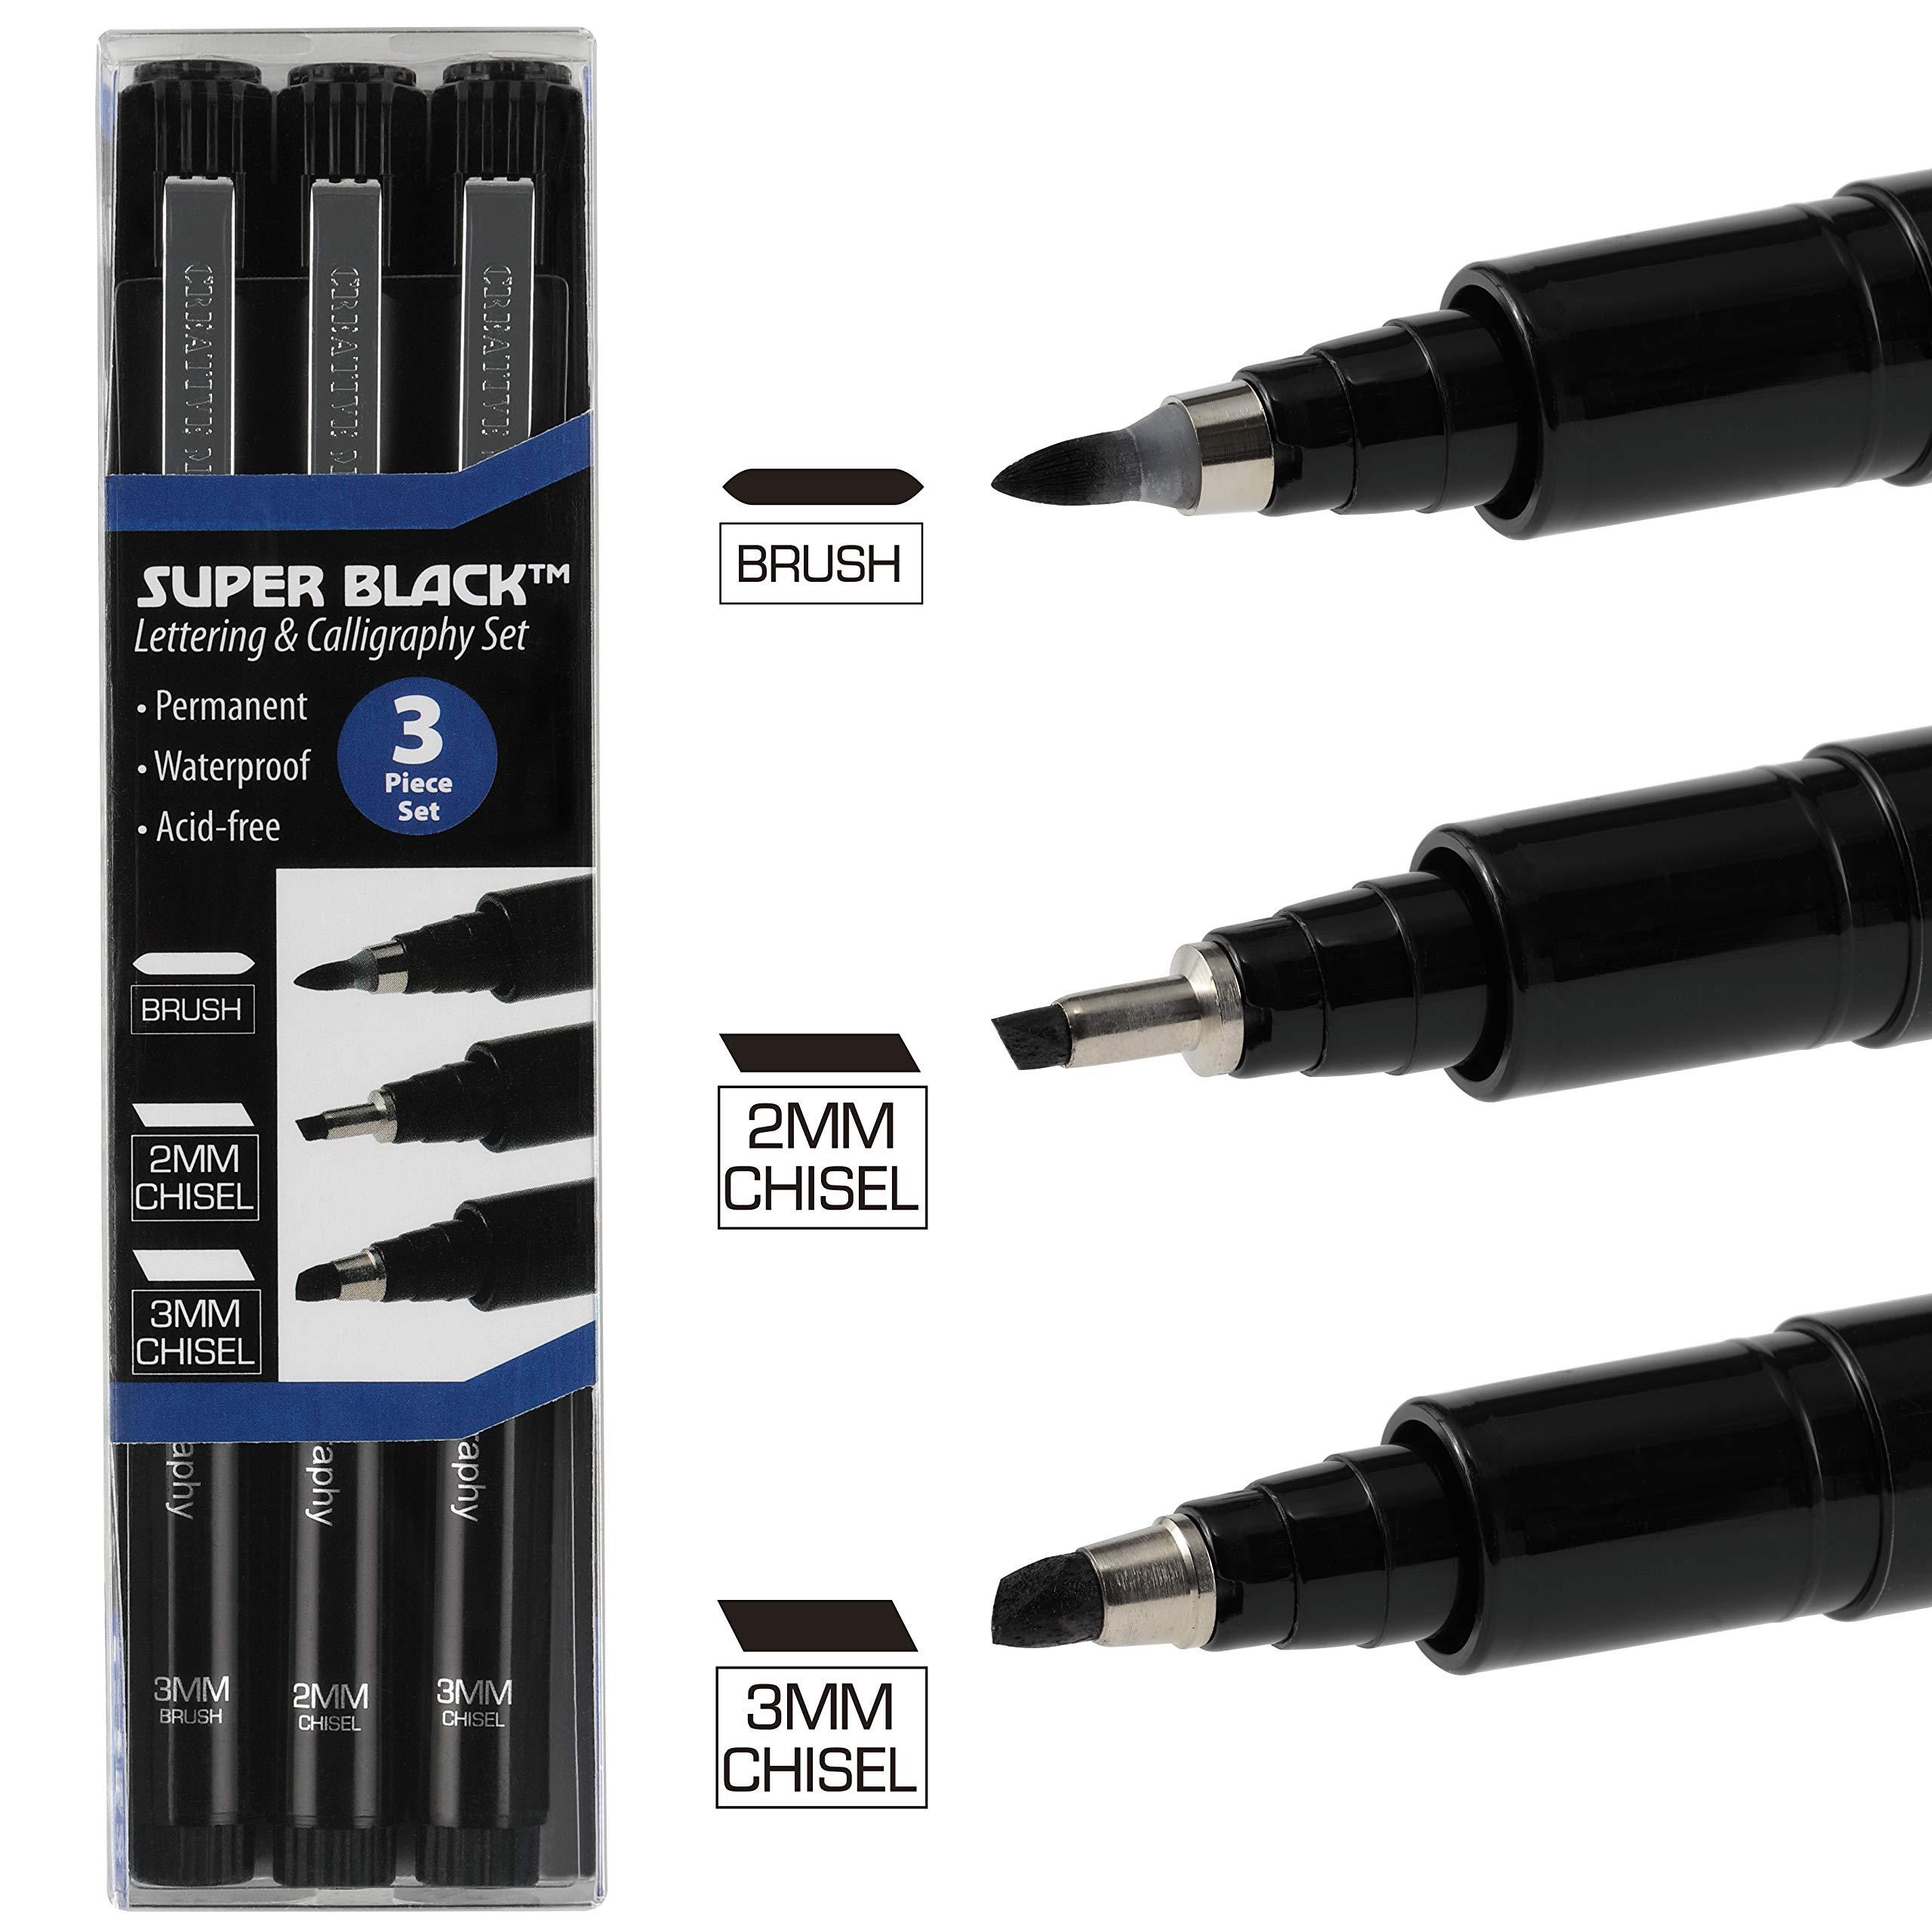 Creative Mark Calligraphy & Fineliner Pen Set Lettering Drawing Super Black, Permanent, Waterproof, Acid-Free Chisel Nylon-Nibs Pens & Medium Brush Tip - [Lettering & Calligraphy Set of 3] by Creative Mark